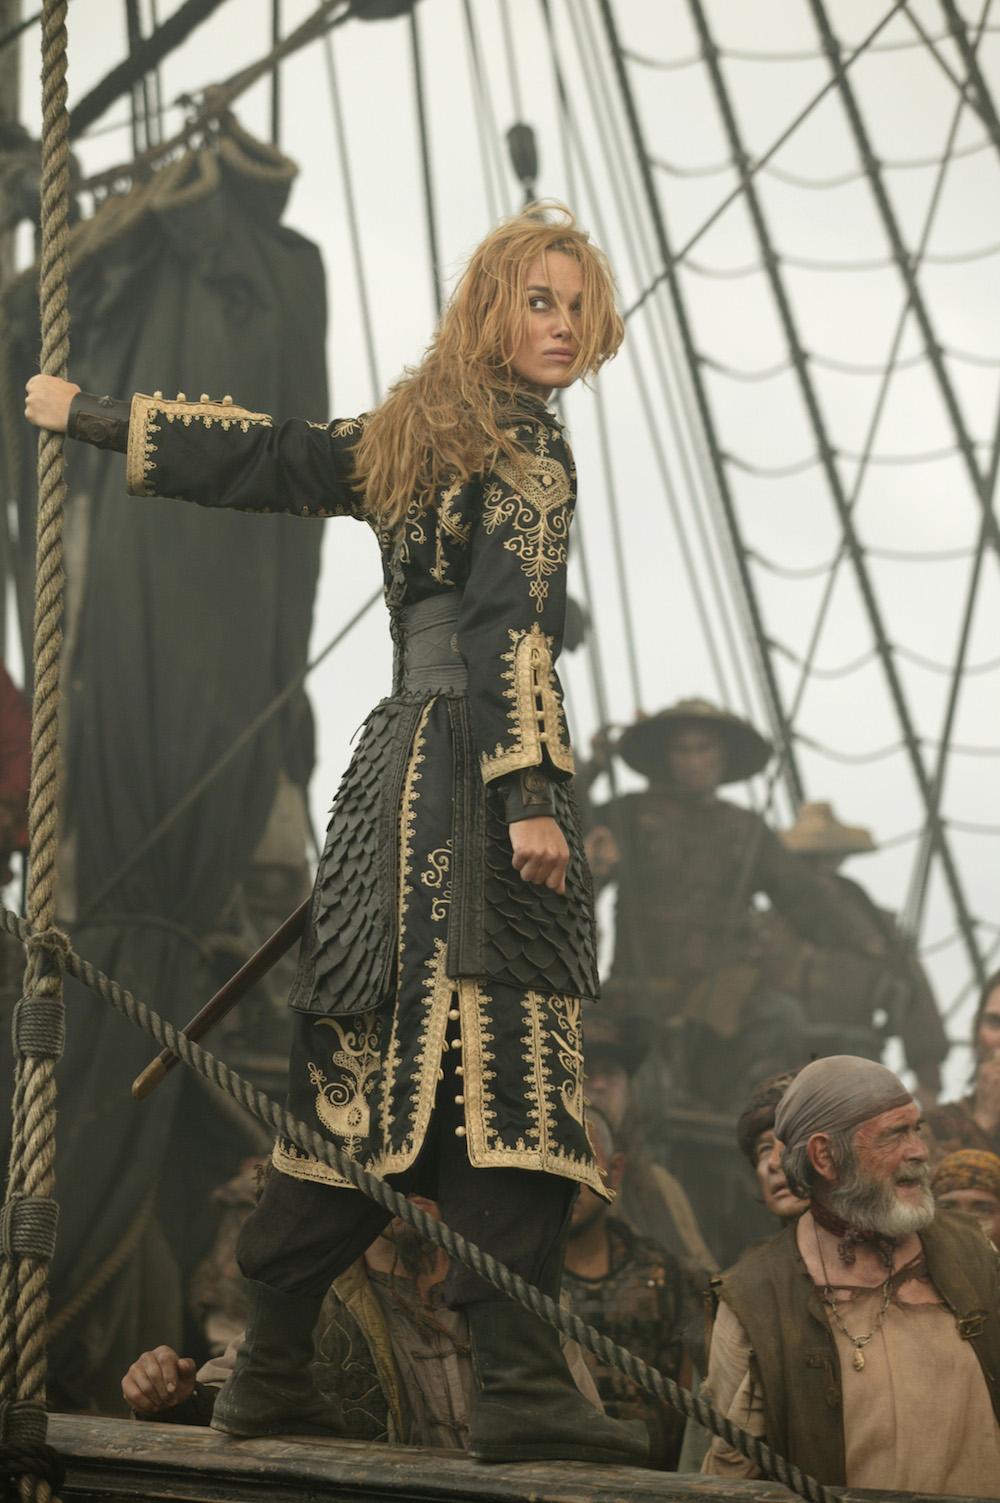 Elizabeth, Pirate Queen.